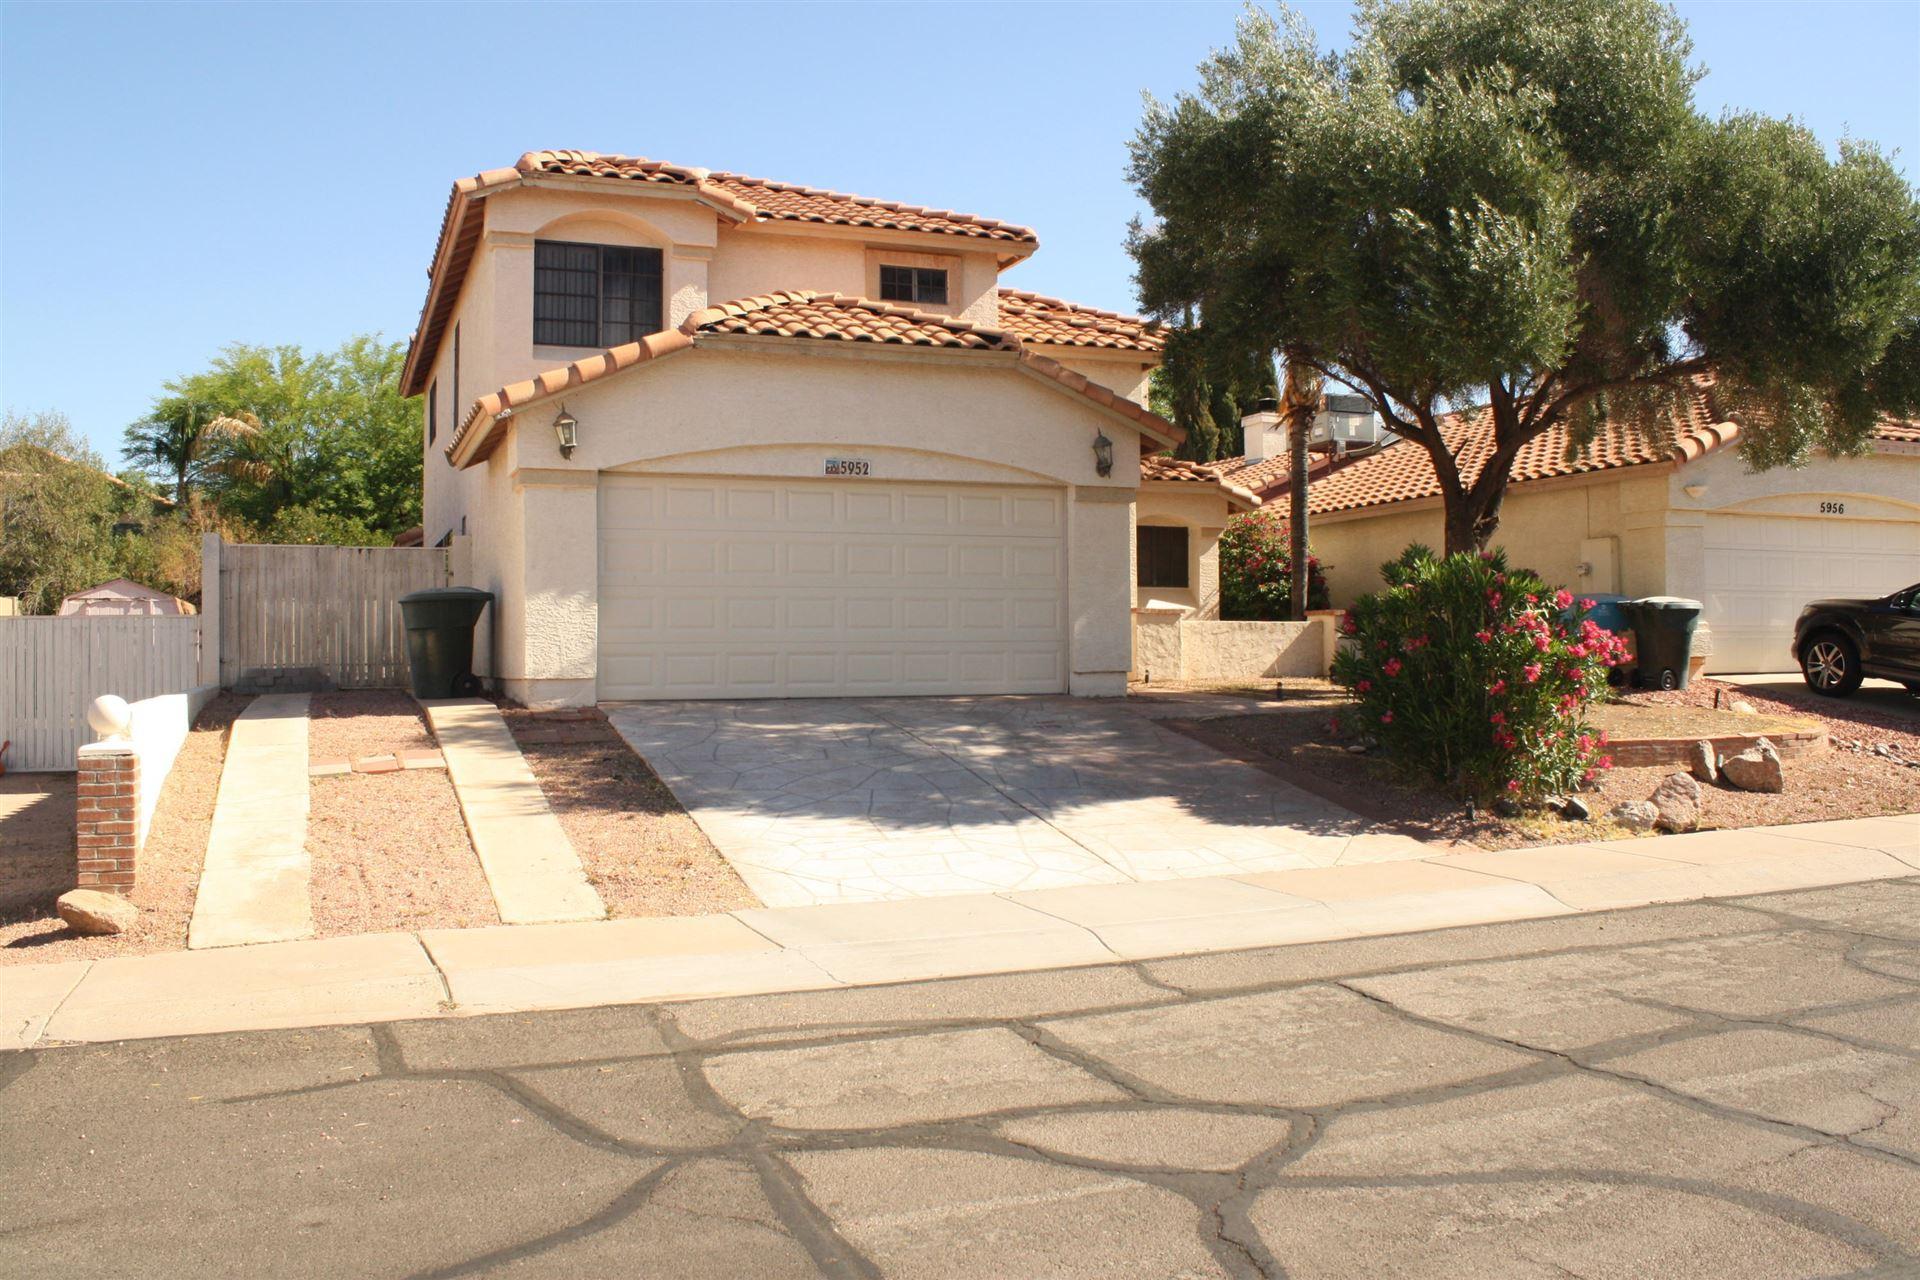 5952 E AIRE LIBRE Lane, Scottsdale, AZ 85254 - MLS#: 6229965